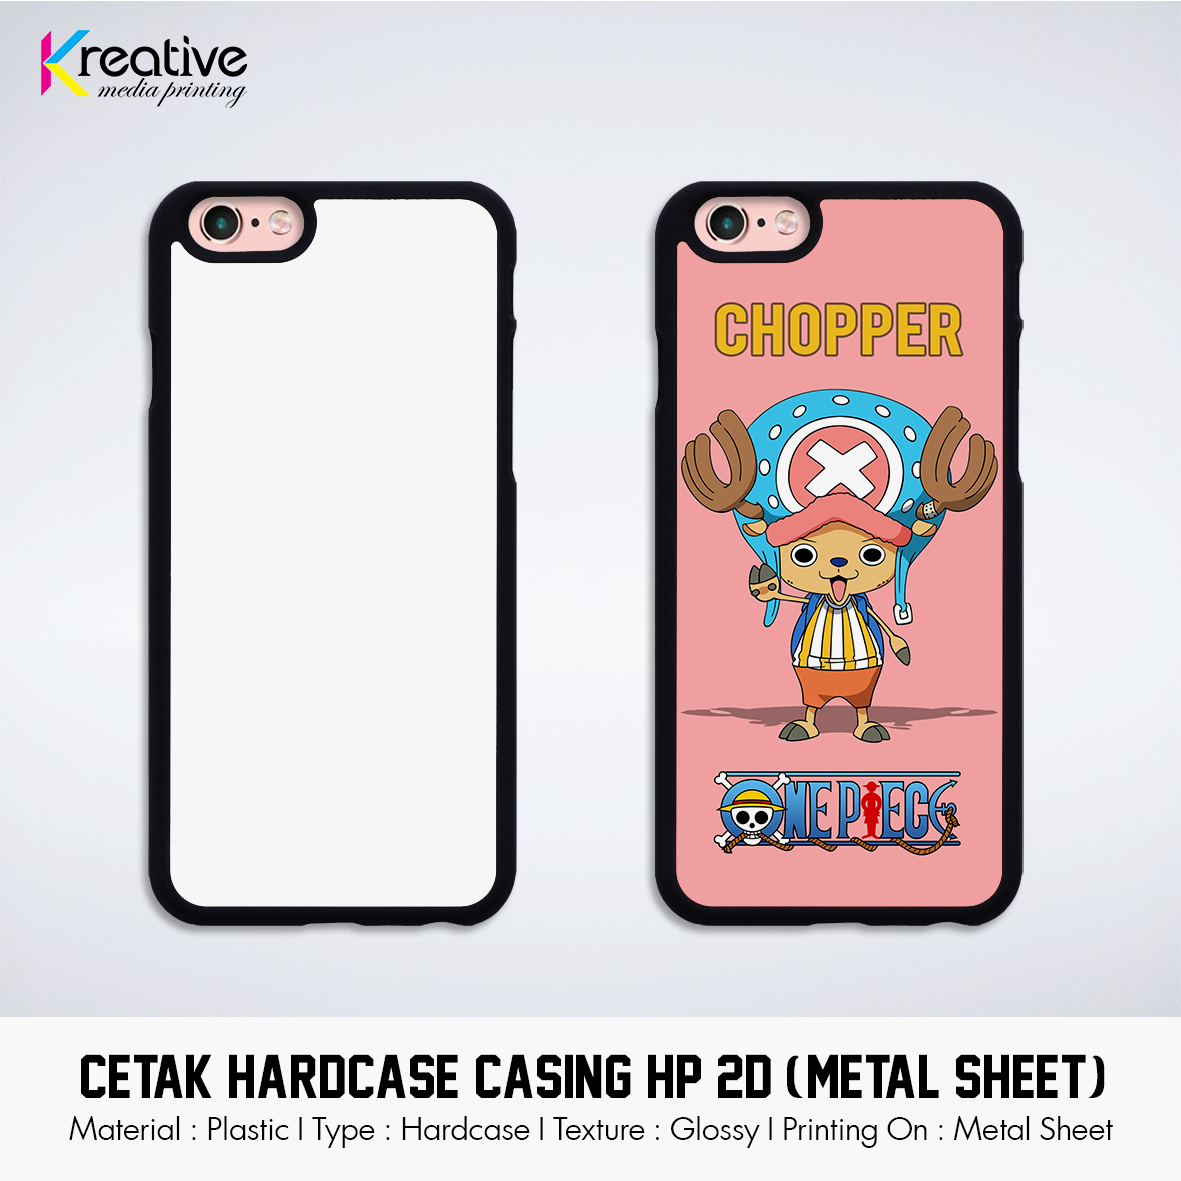 Cetak Hardcase Casing HP 2D (Metal Sheet, Black Colour) (1)